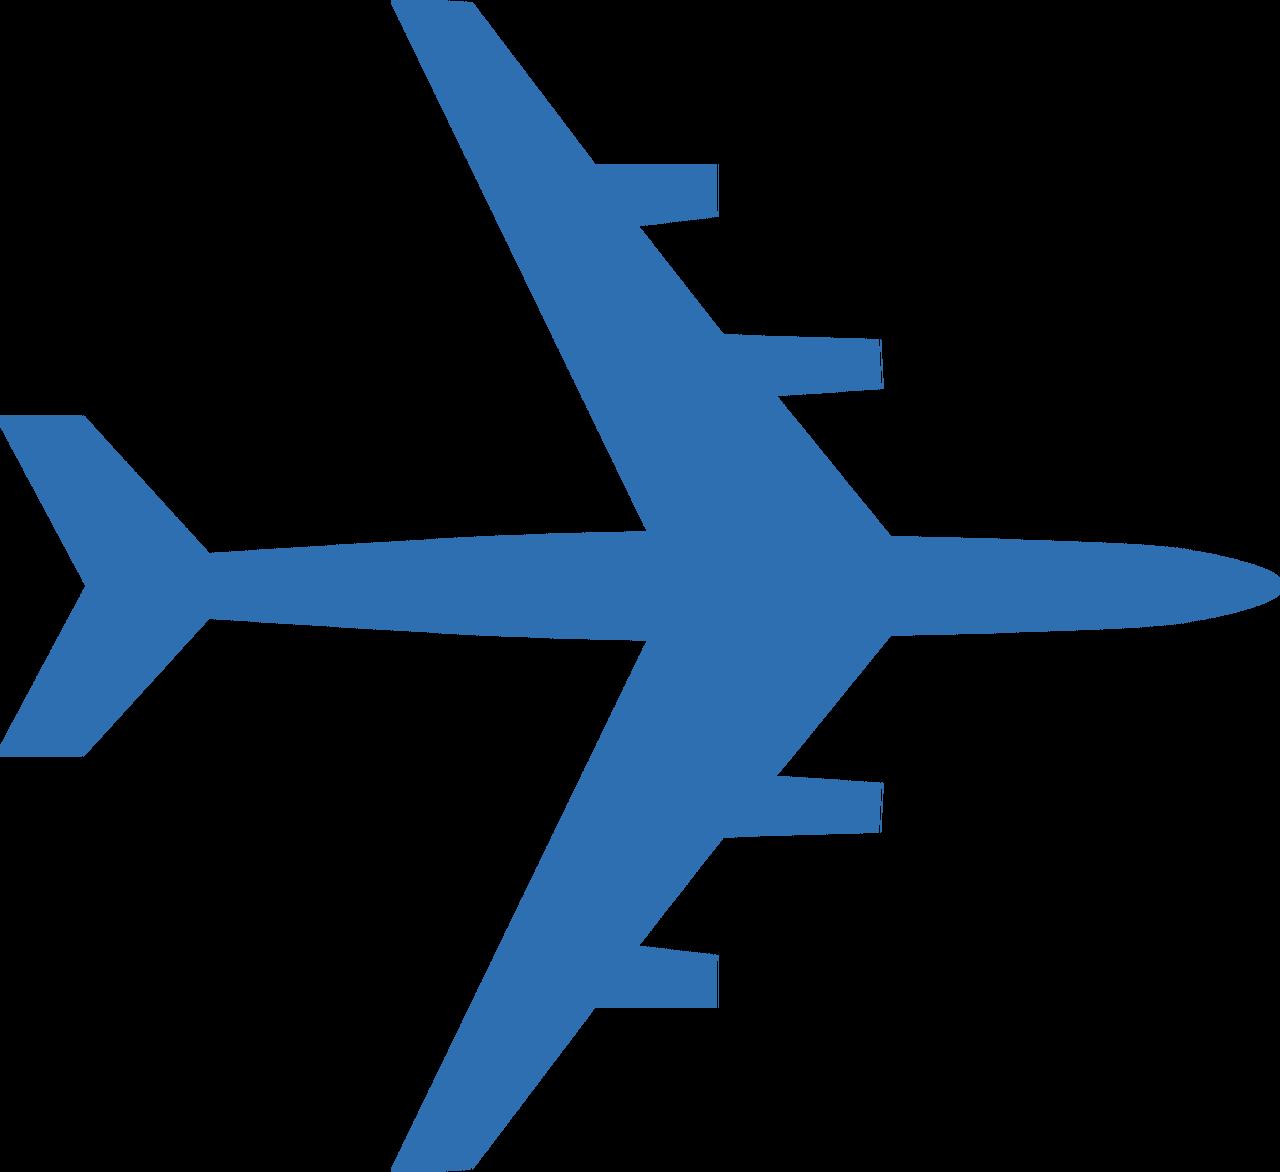 Airplane #4 SVG Cut File